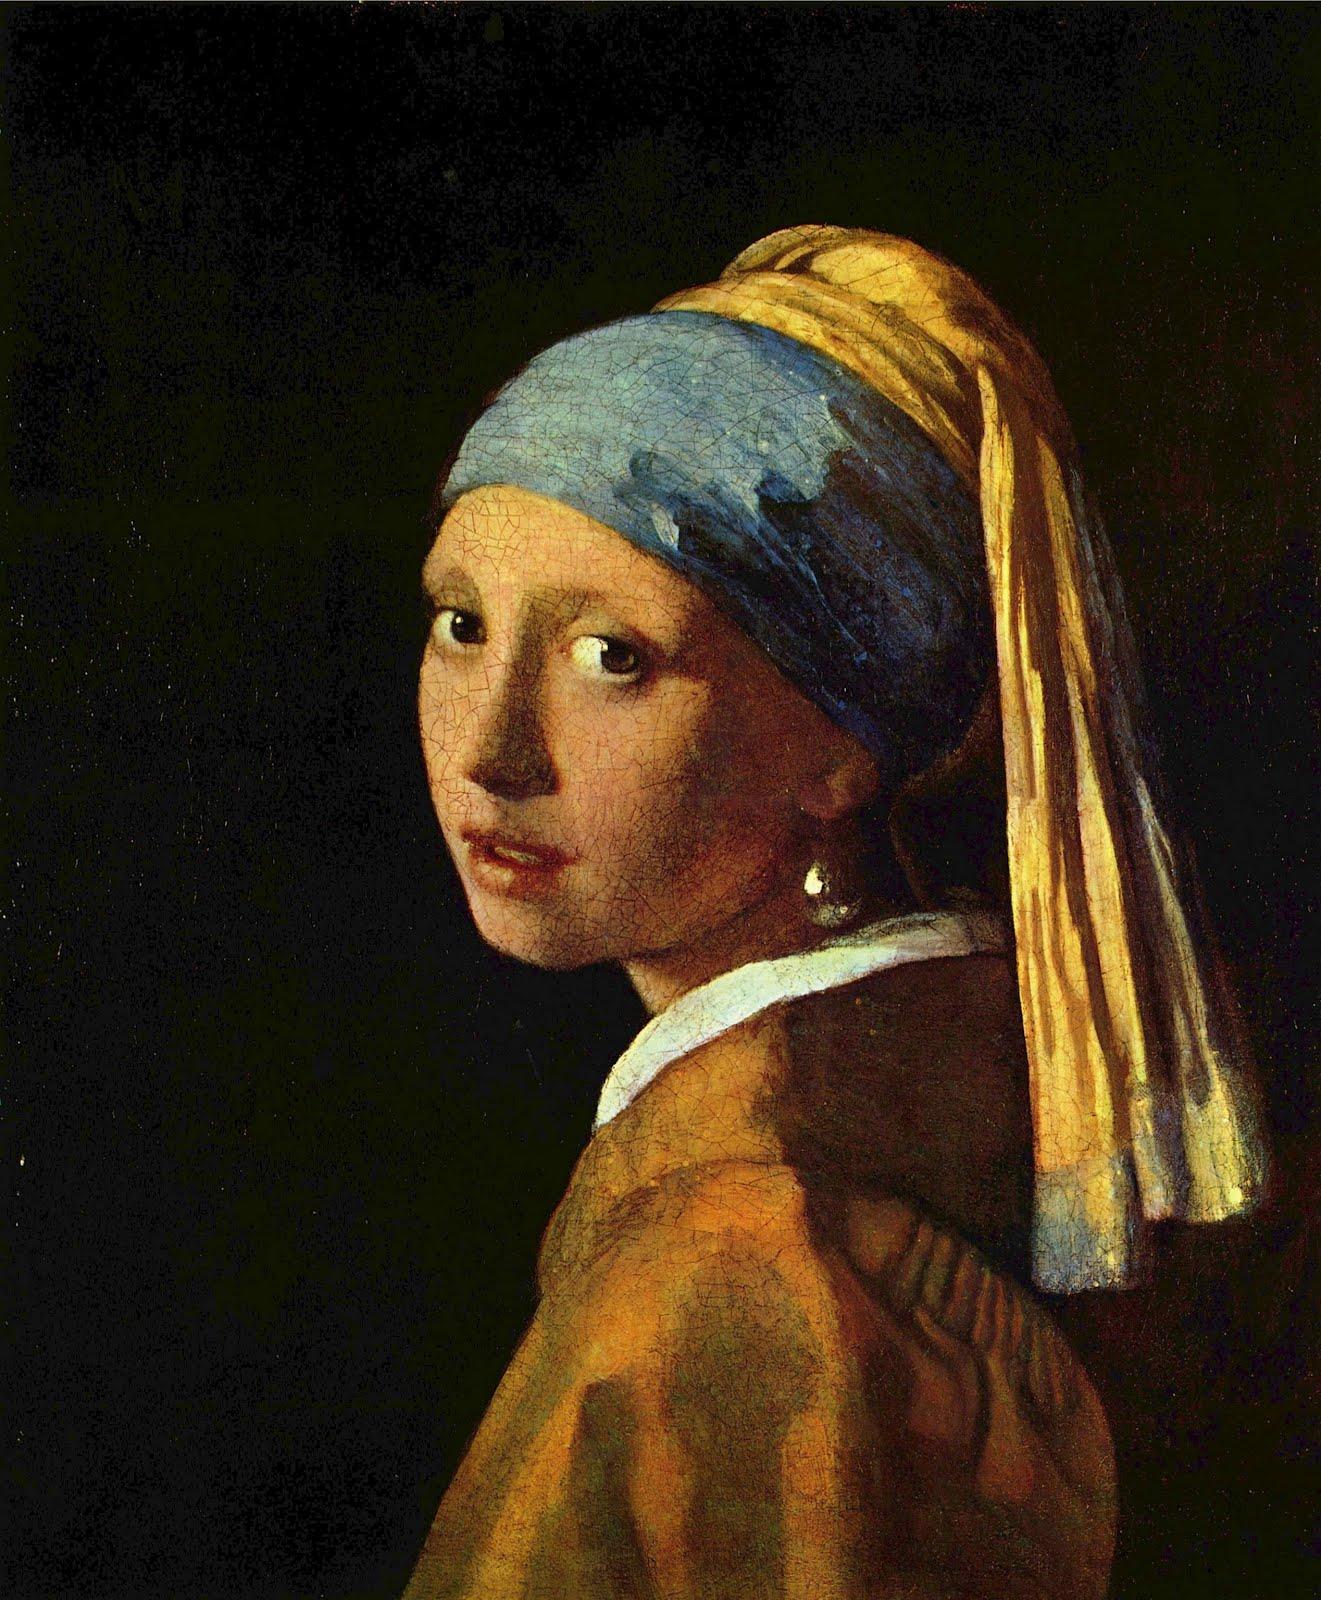 Illuminaries Johannes Jan Vermeer